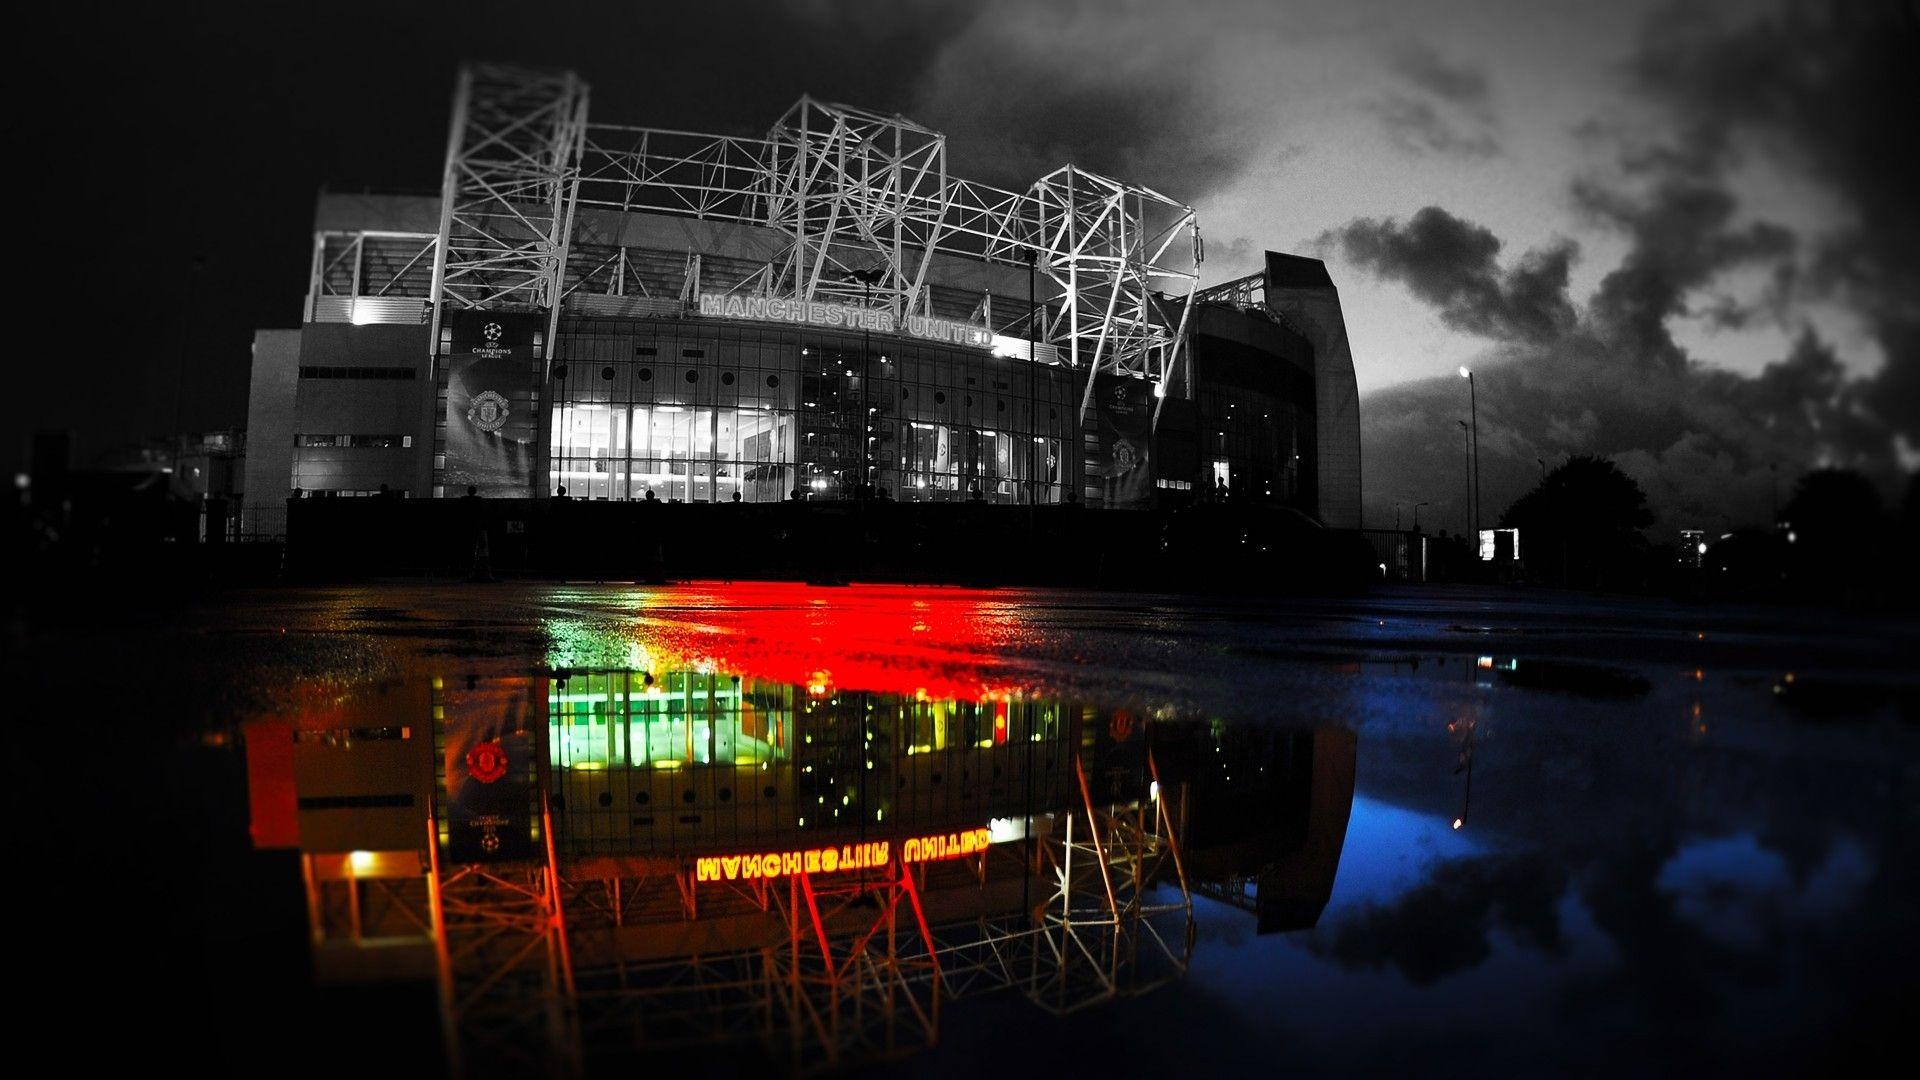 The Best Manchester United Stadium Night